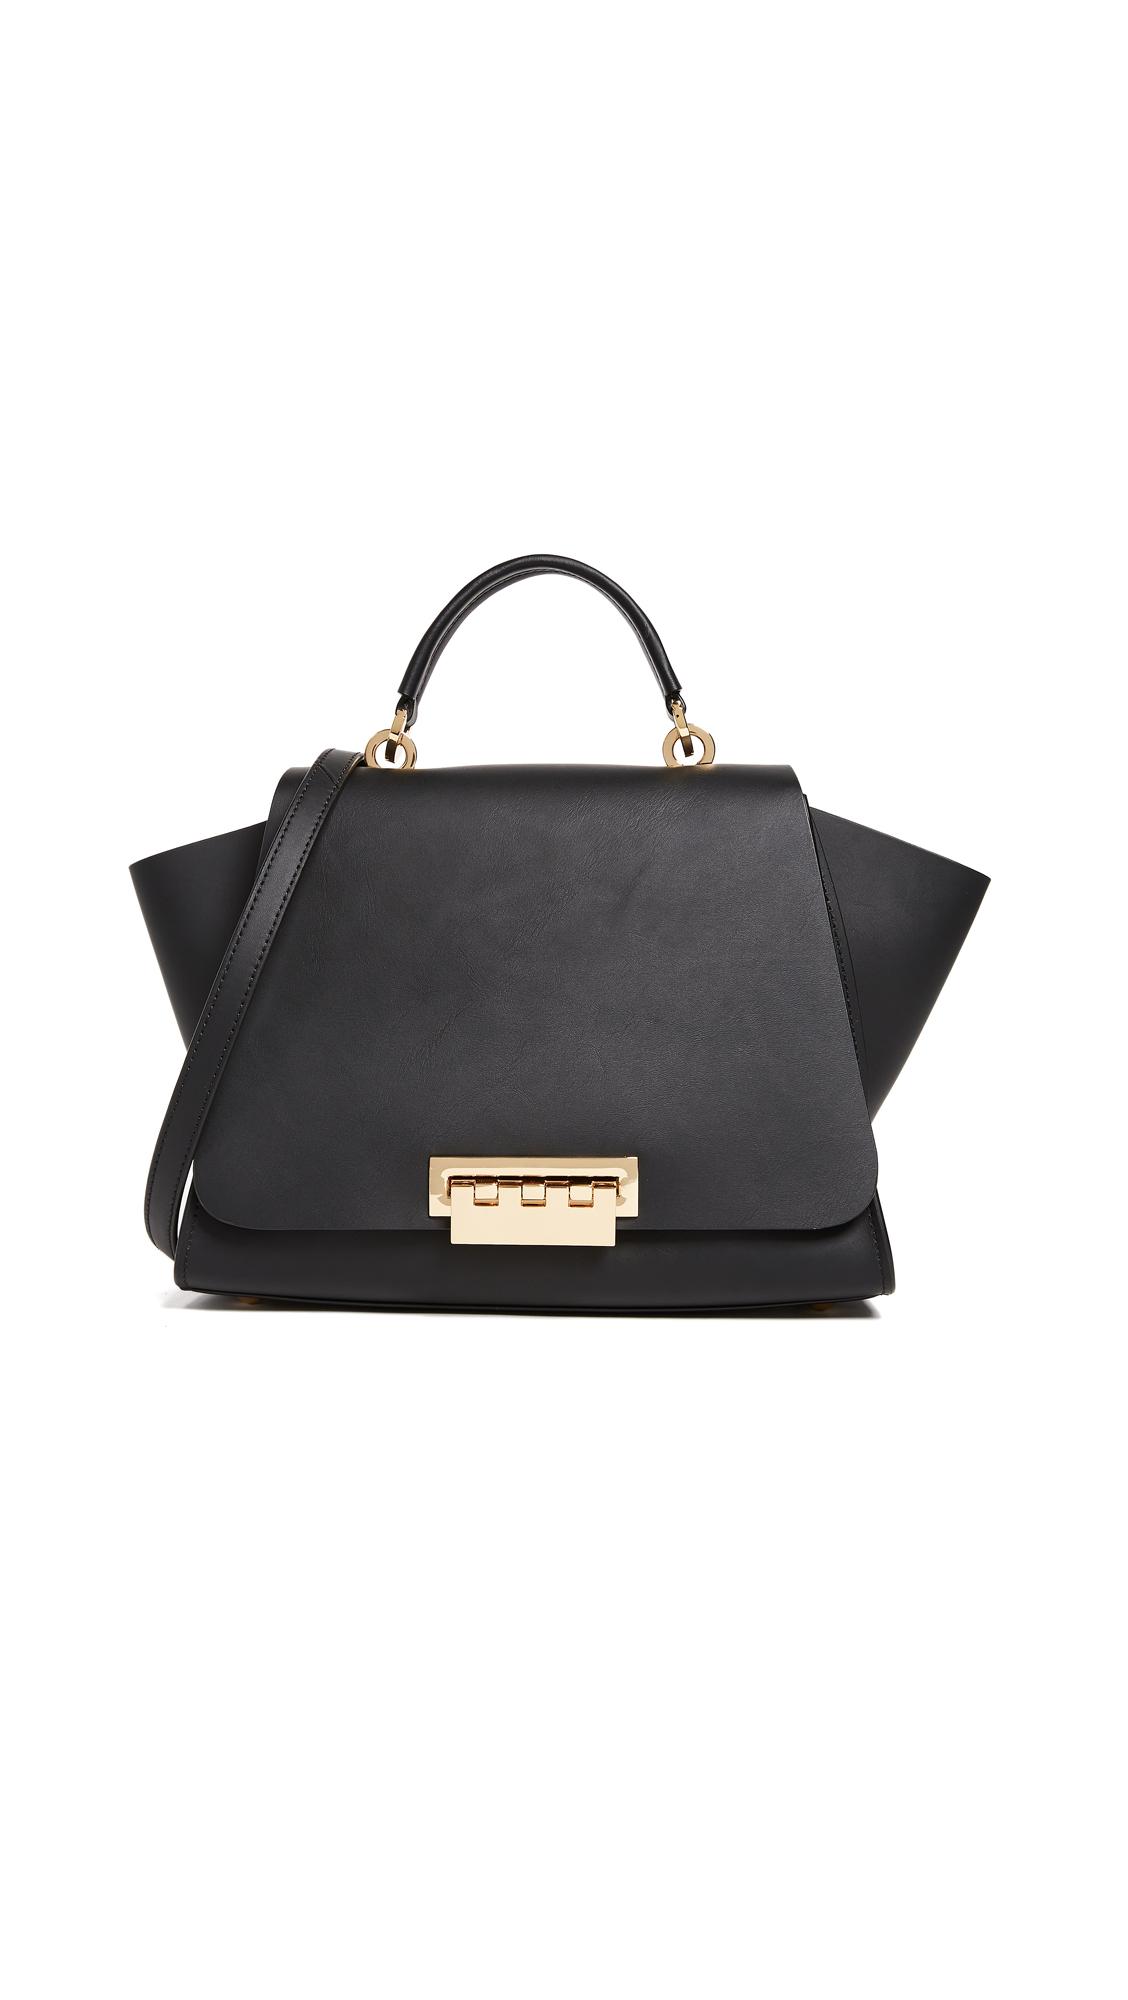 ZAC Zac Posen Eartha Soft Top Handle Bag - Black